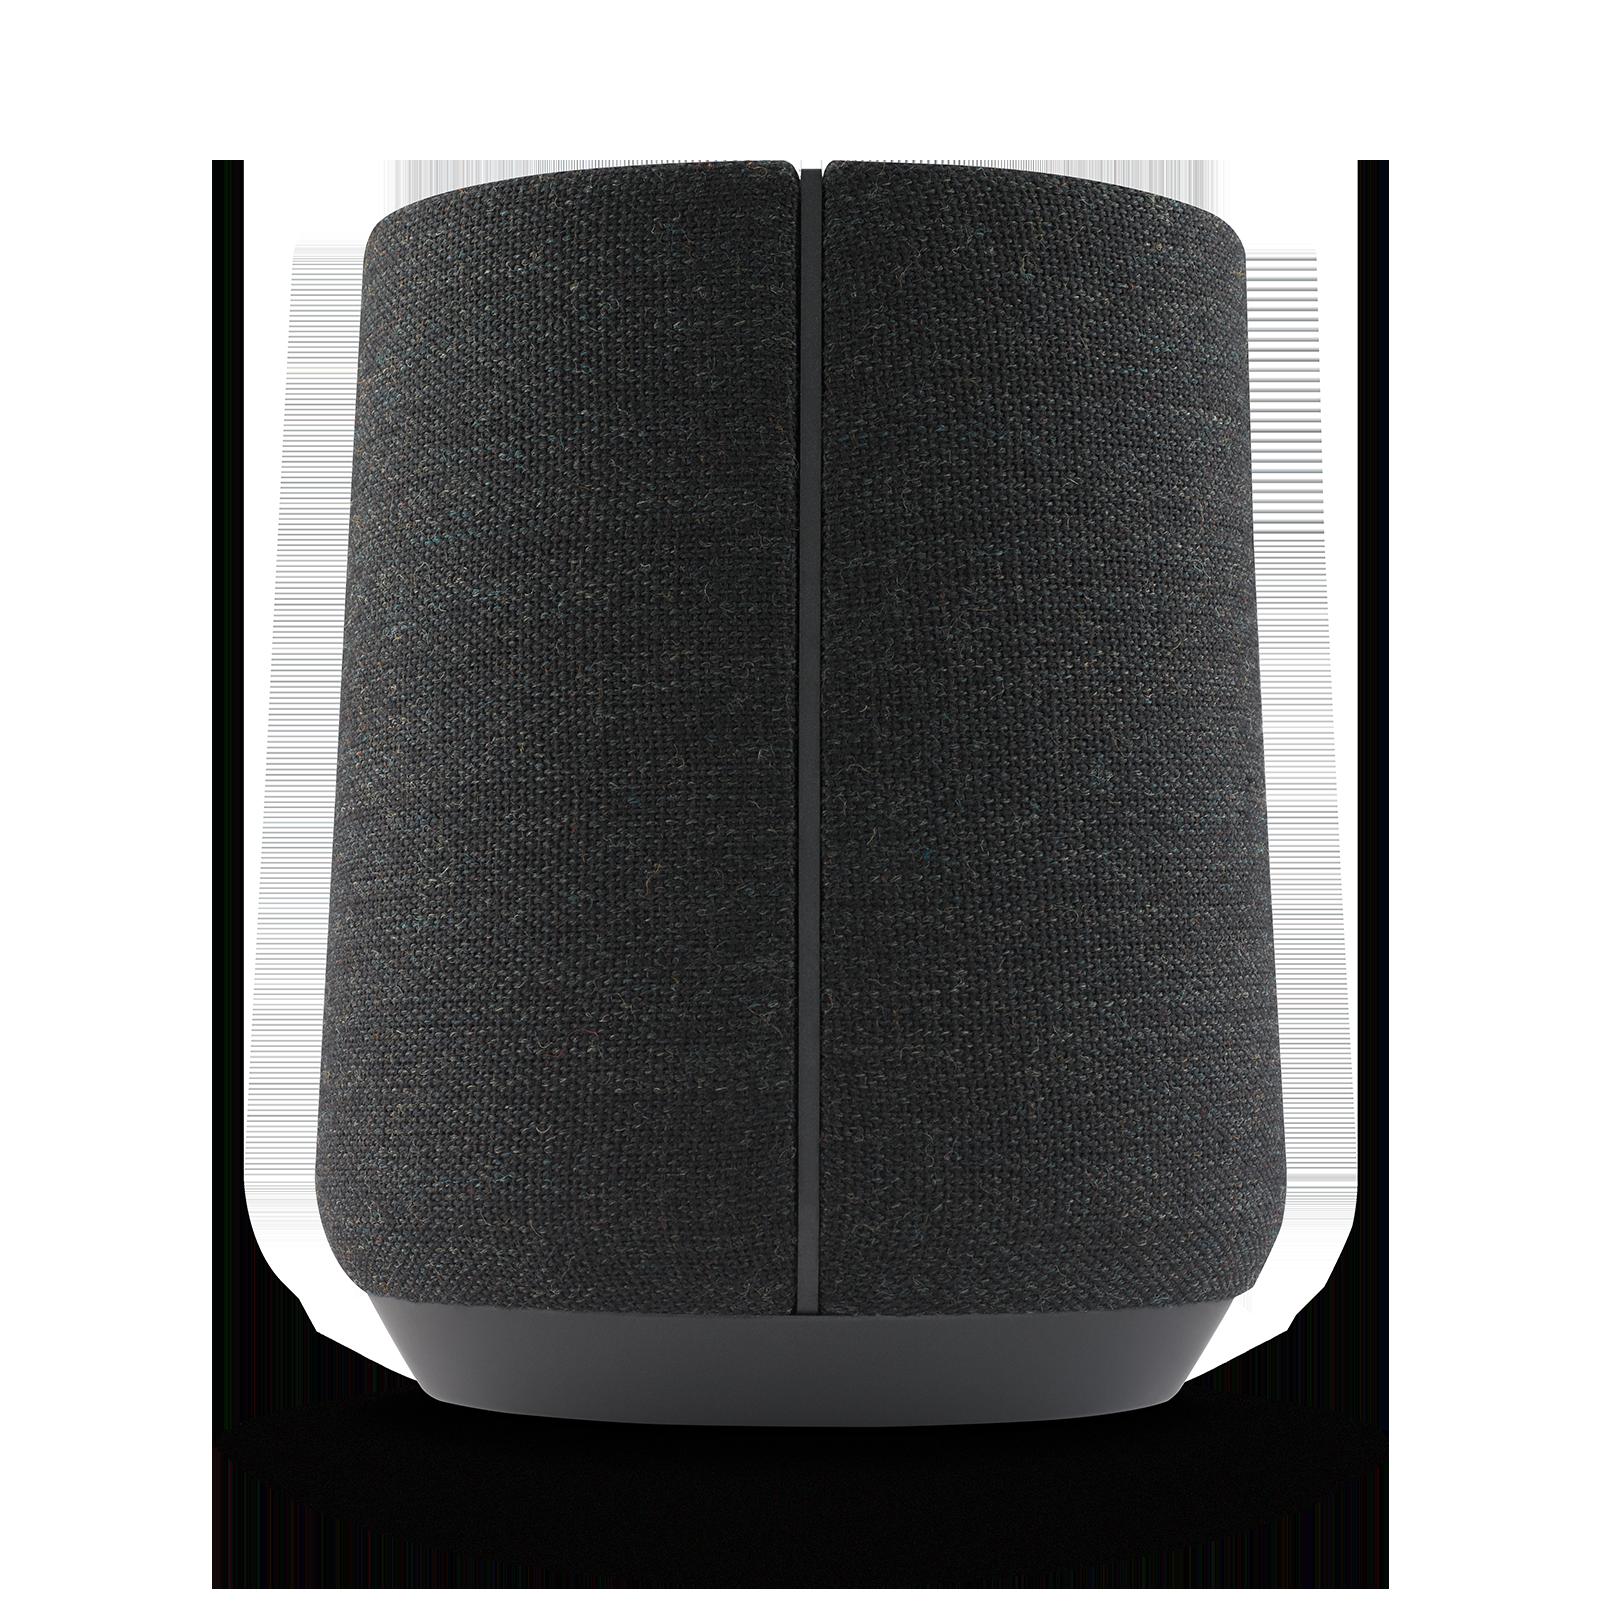 Harman Kardon Citation 300 - Black - The medium-size smart home speaker with award winning design - Detailshot 3